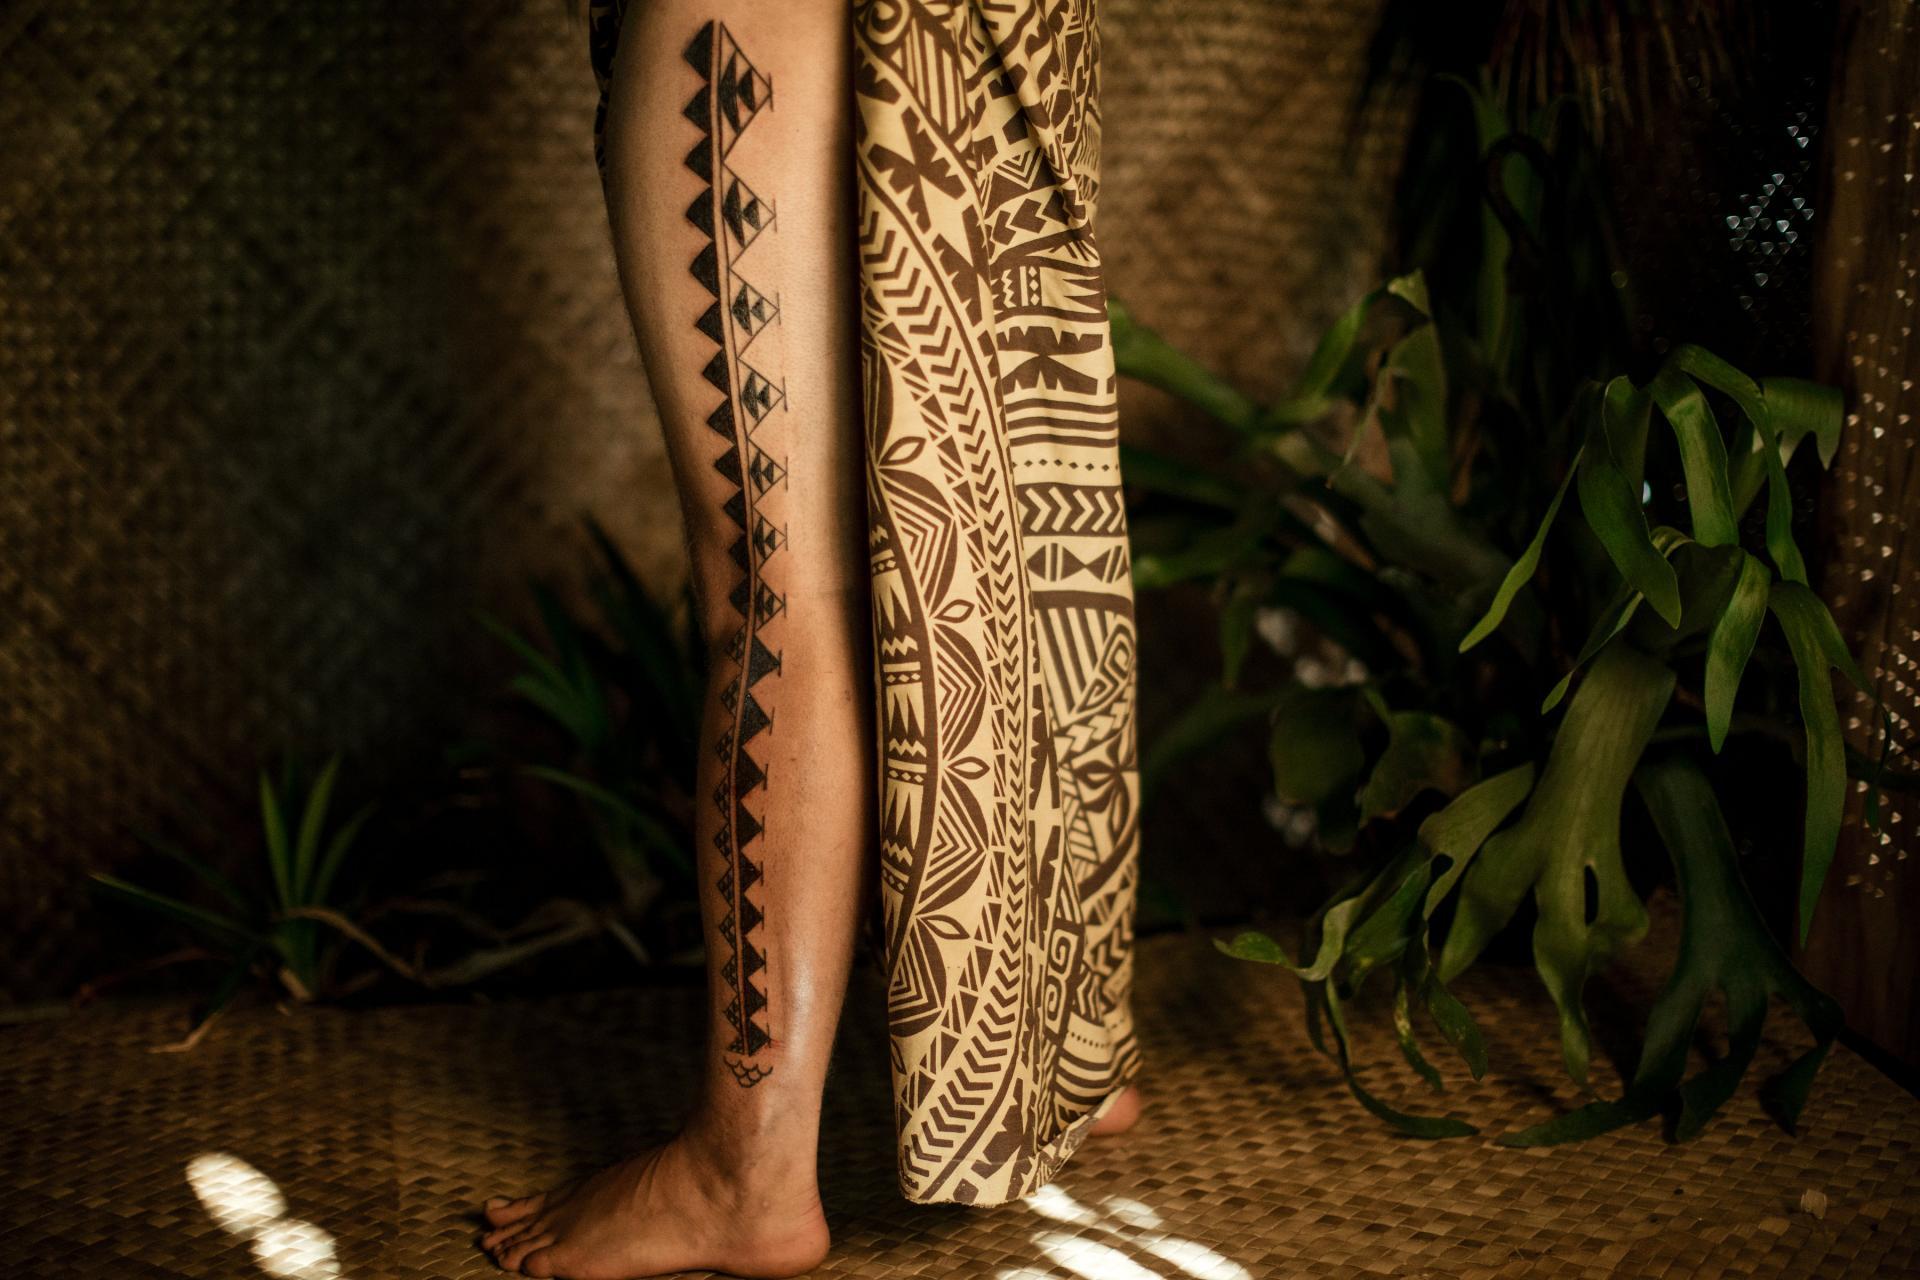 Transformation Through Tattoo